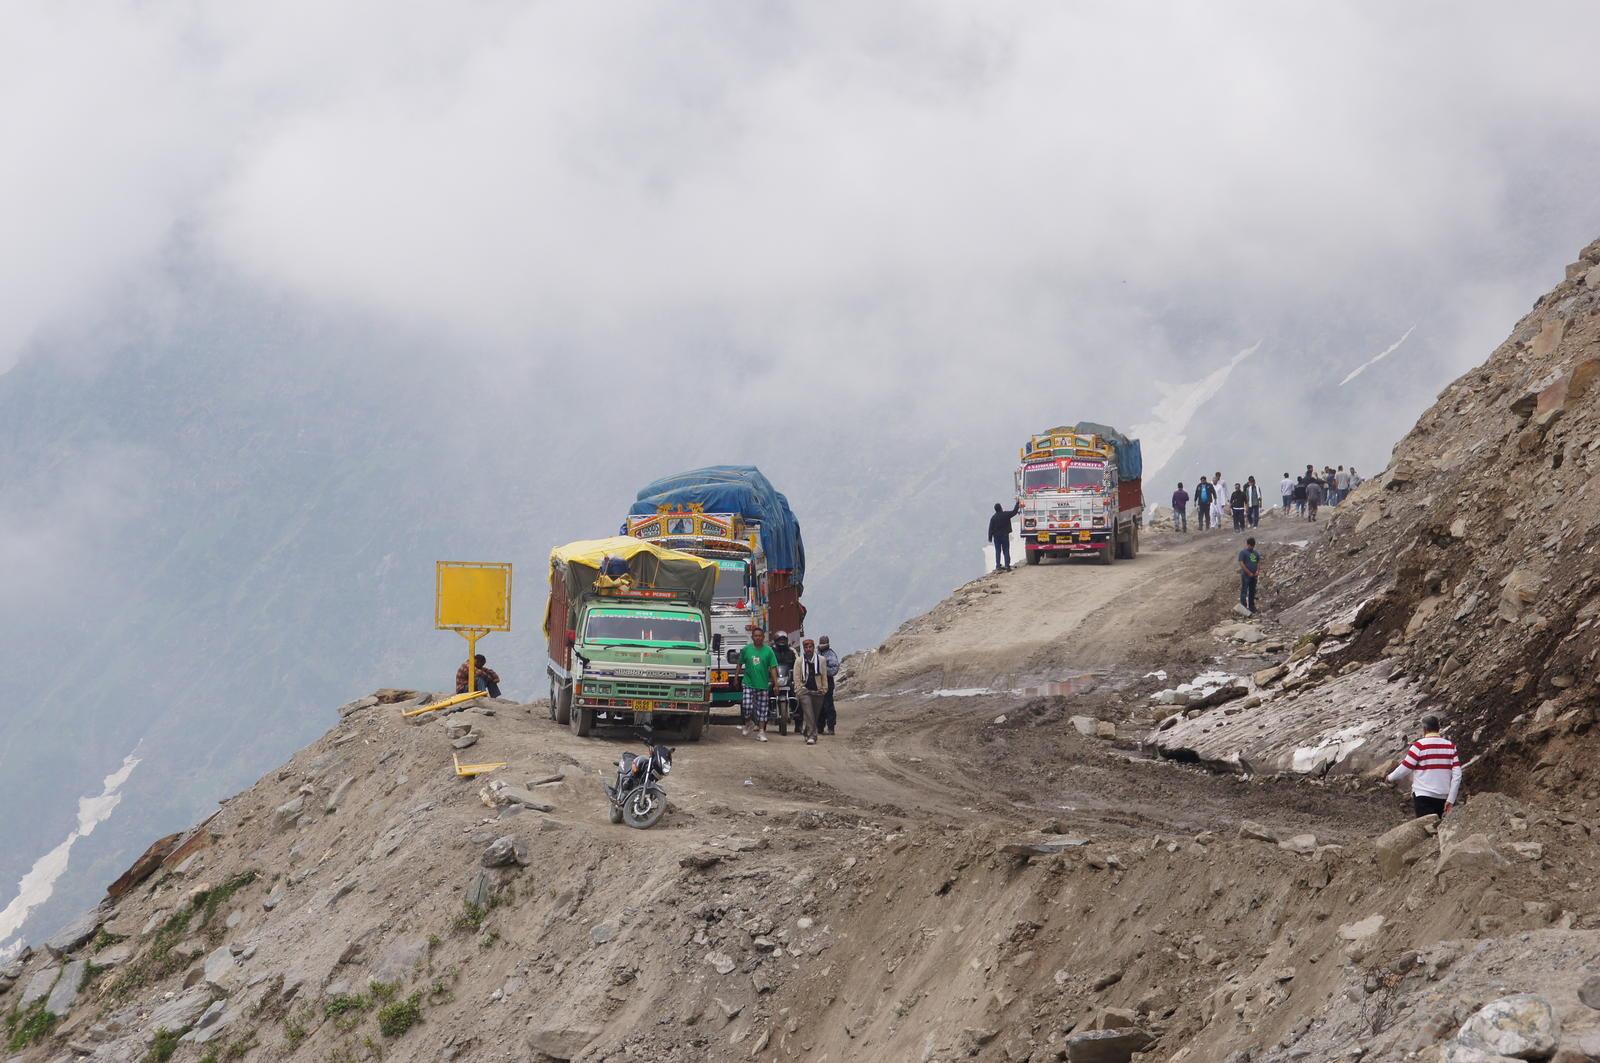 Tramo sin asfaltar en el Rohtang Pass